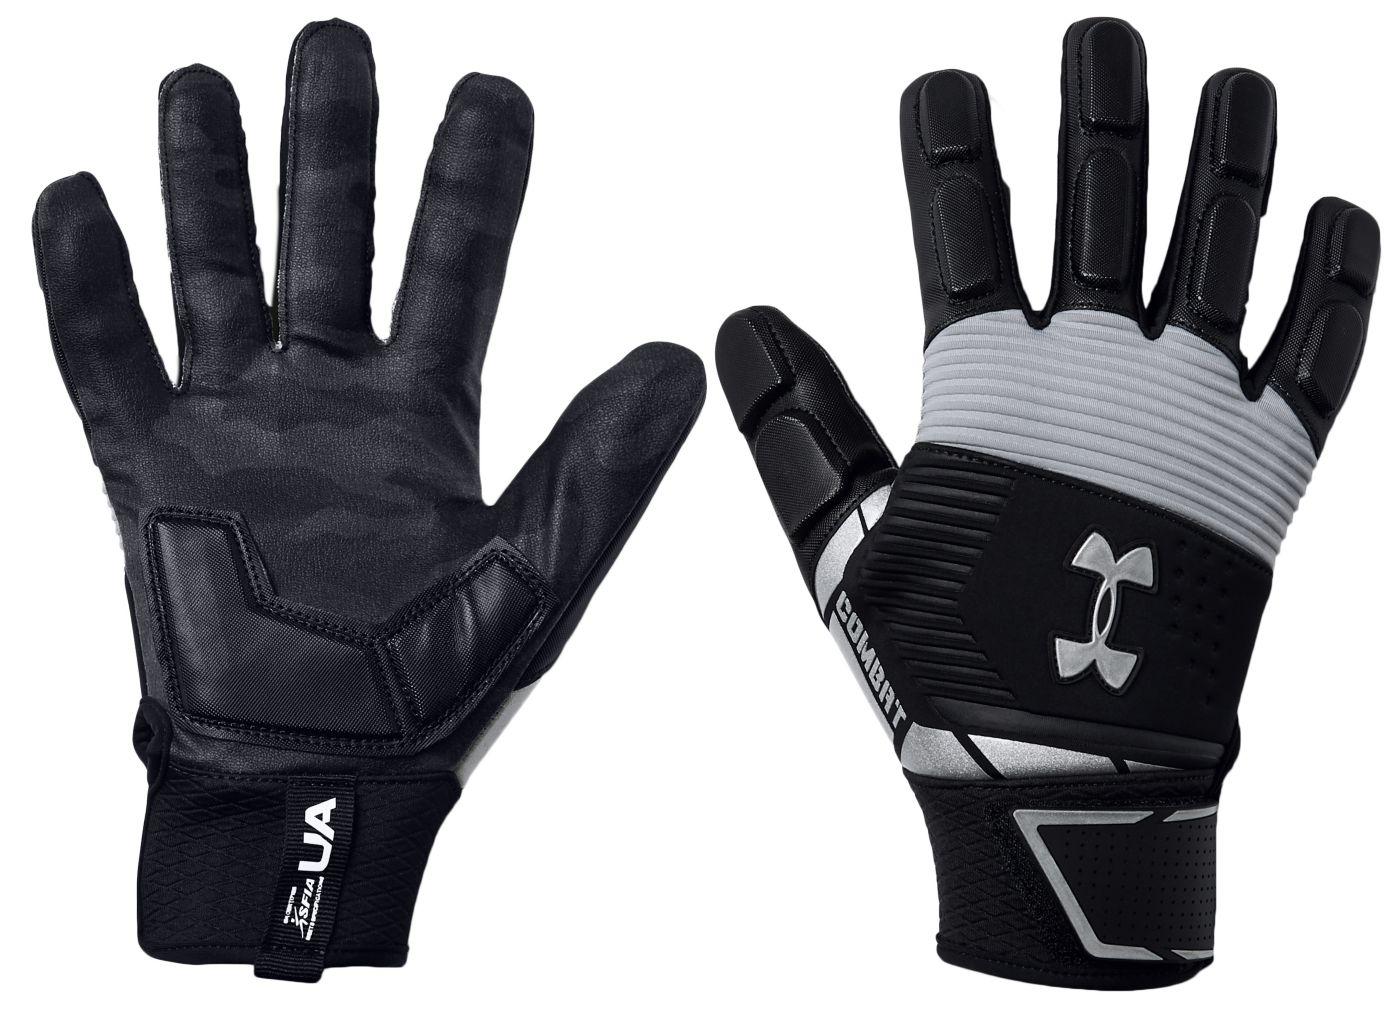 Under Armour Adult Combat Lineman Gloves 2019